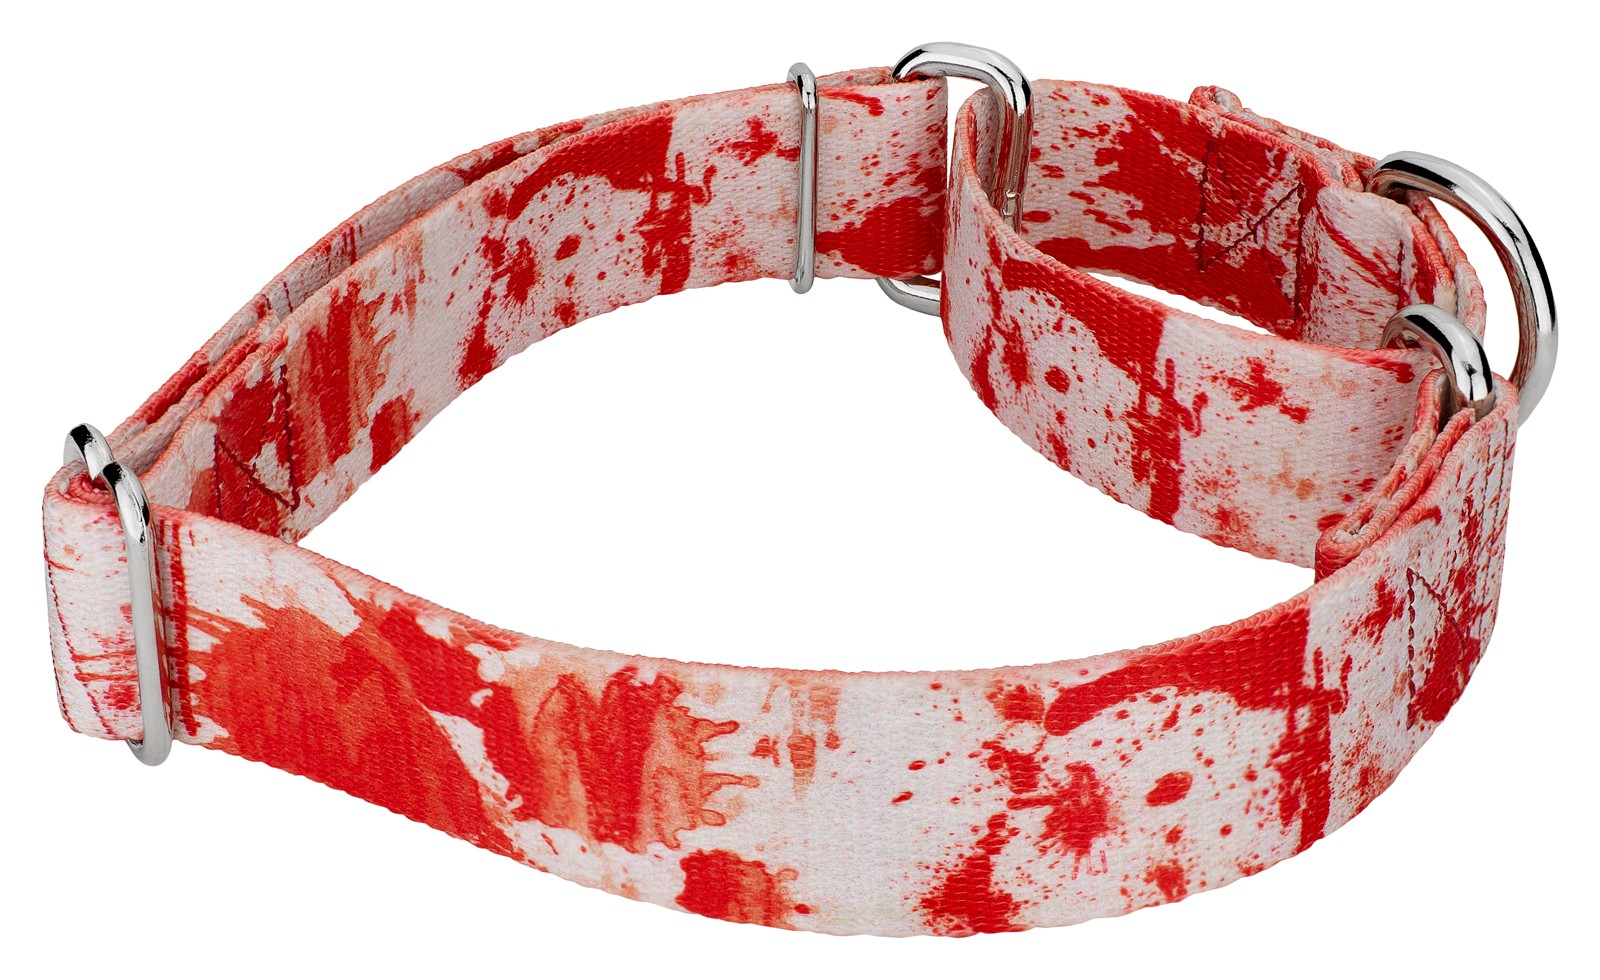 Buy Blood Spatter Martingale Dog Collar & Leash Online